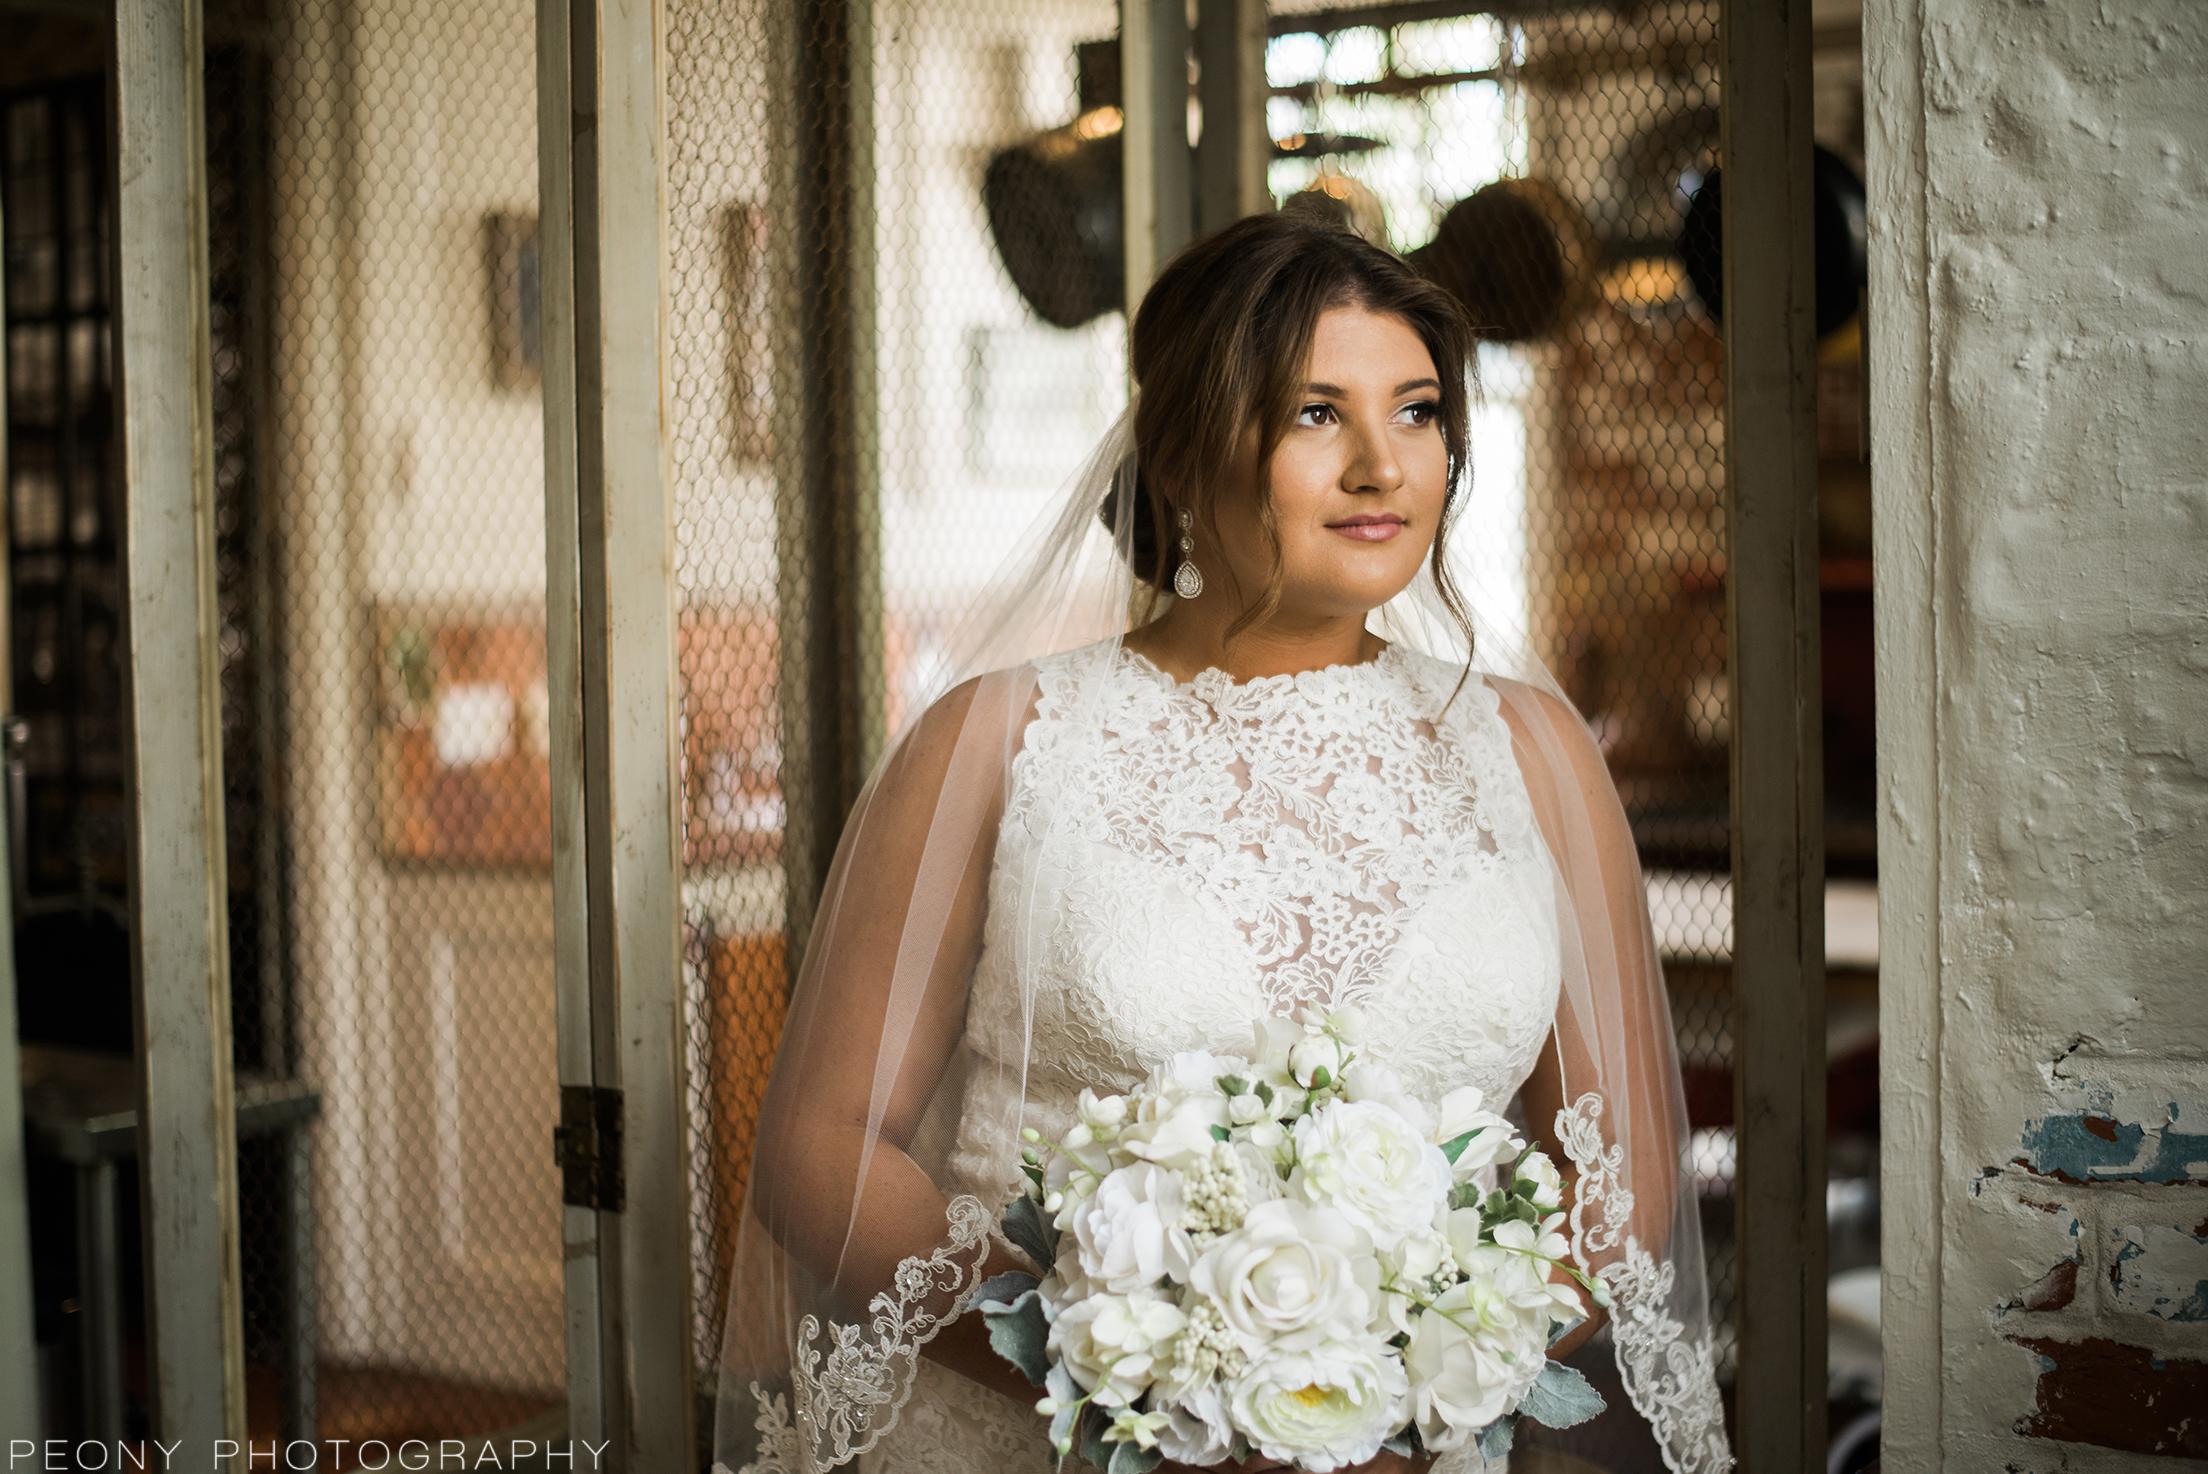 old-world-charm-bride